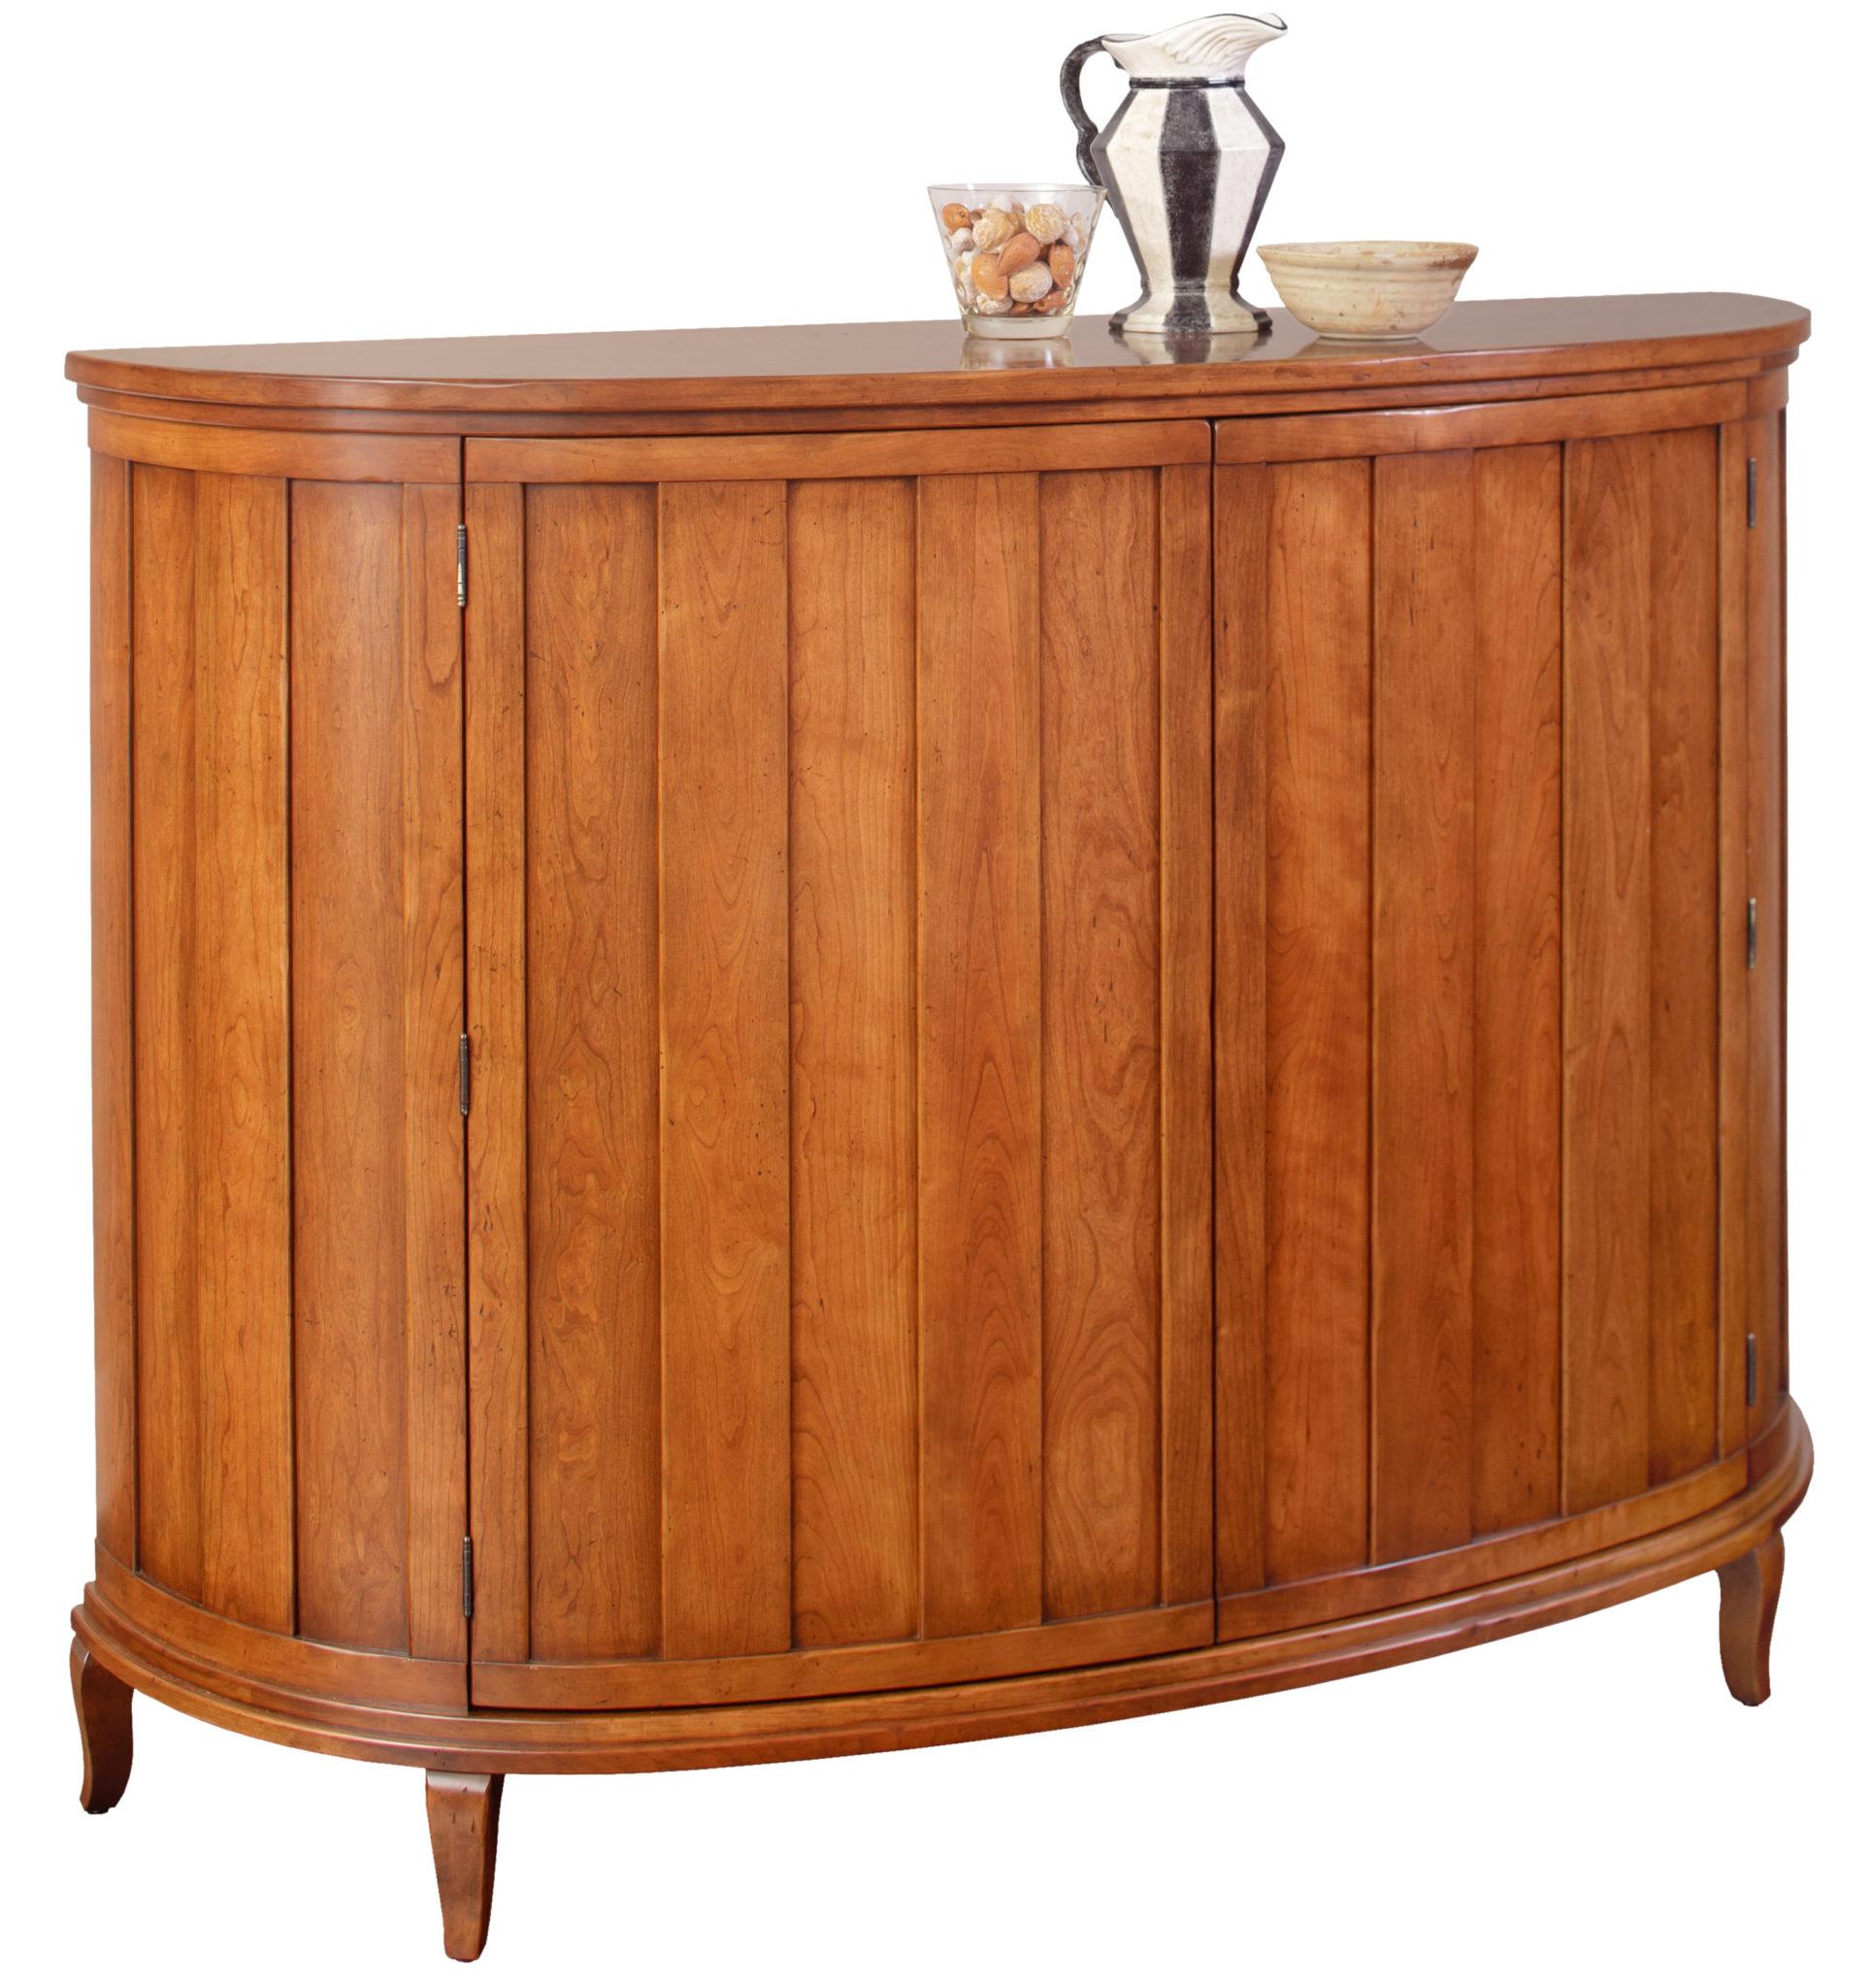 Designer Demi Lune Cabinet Image